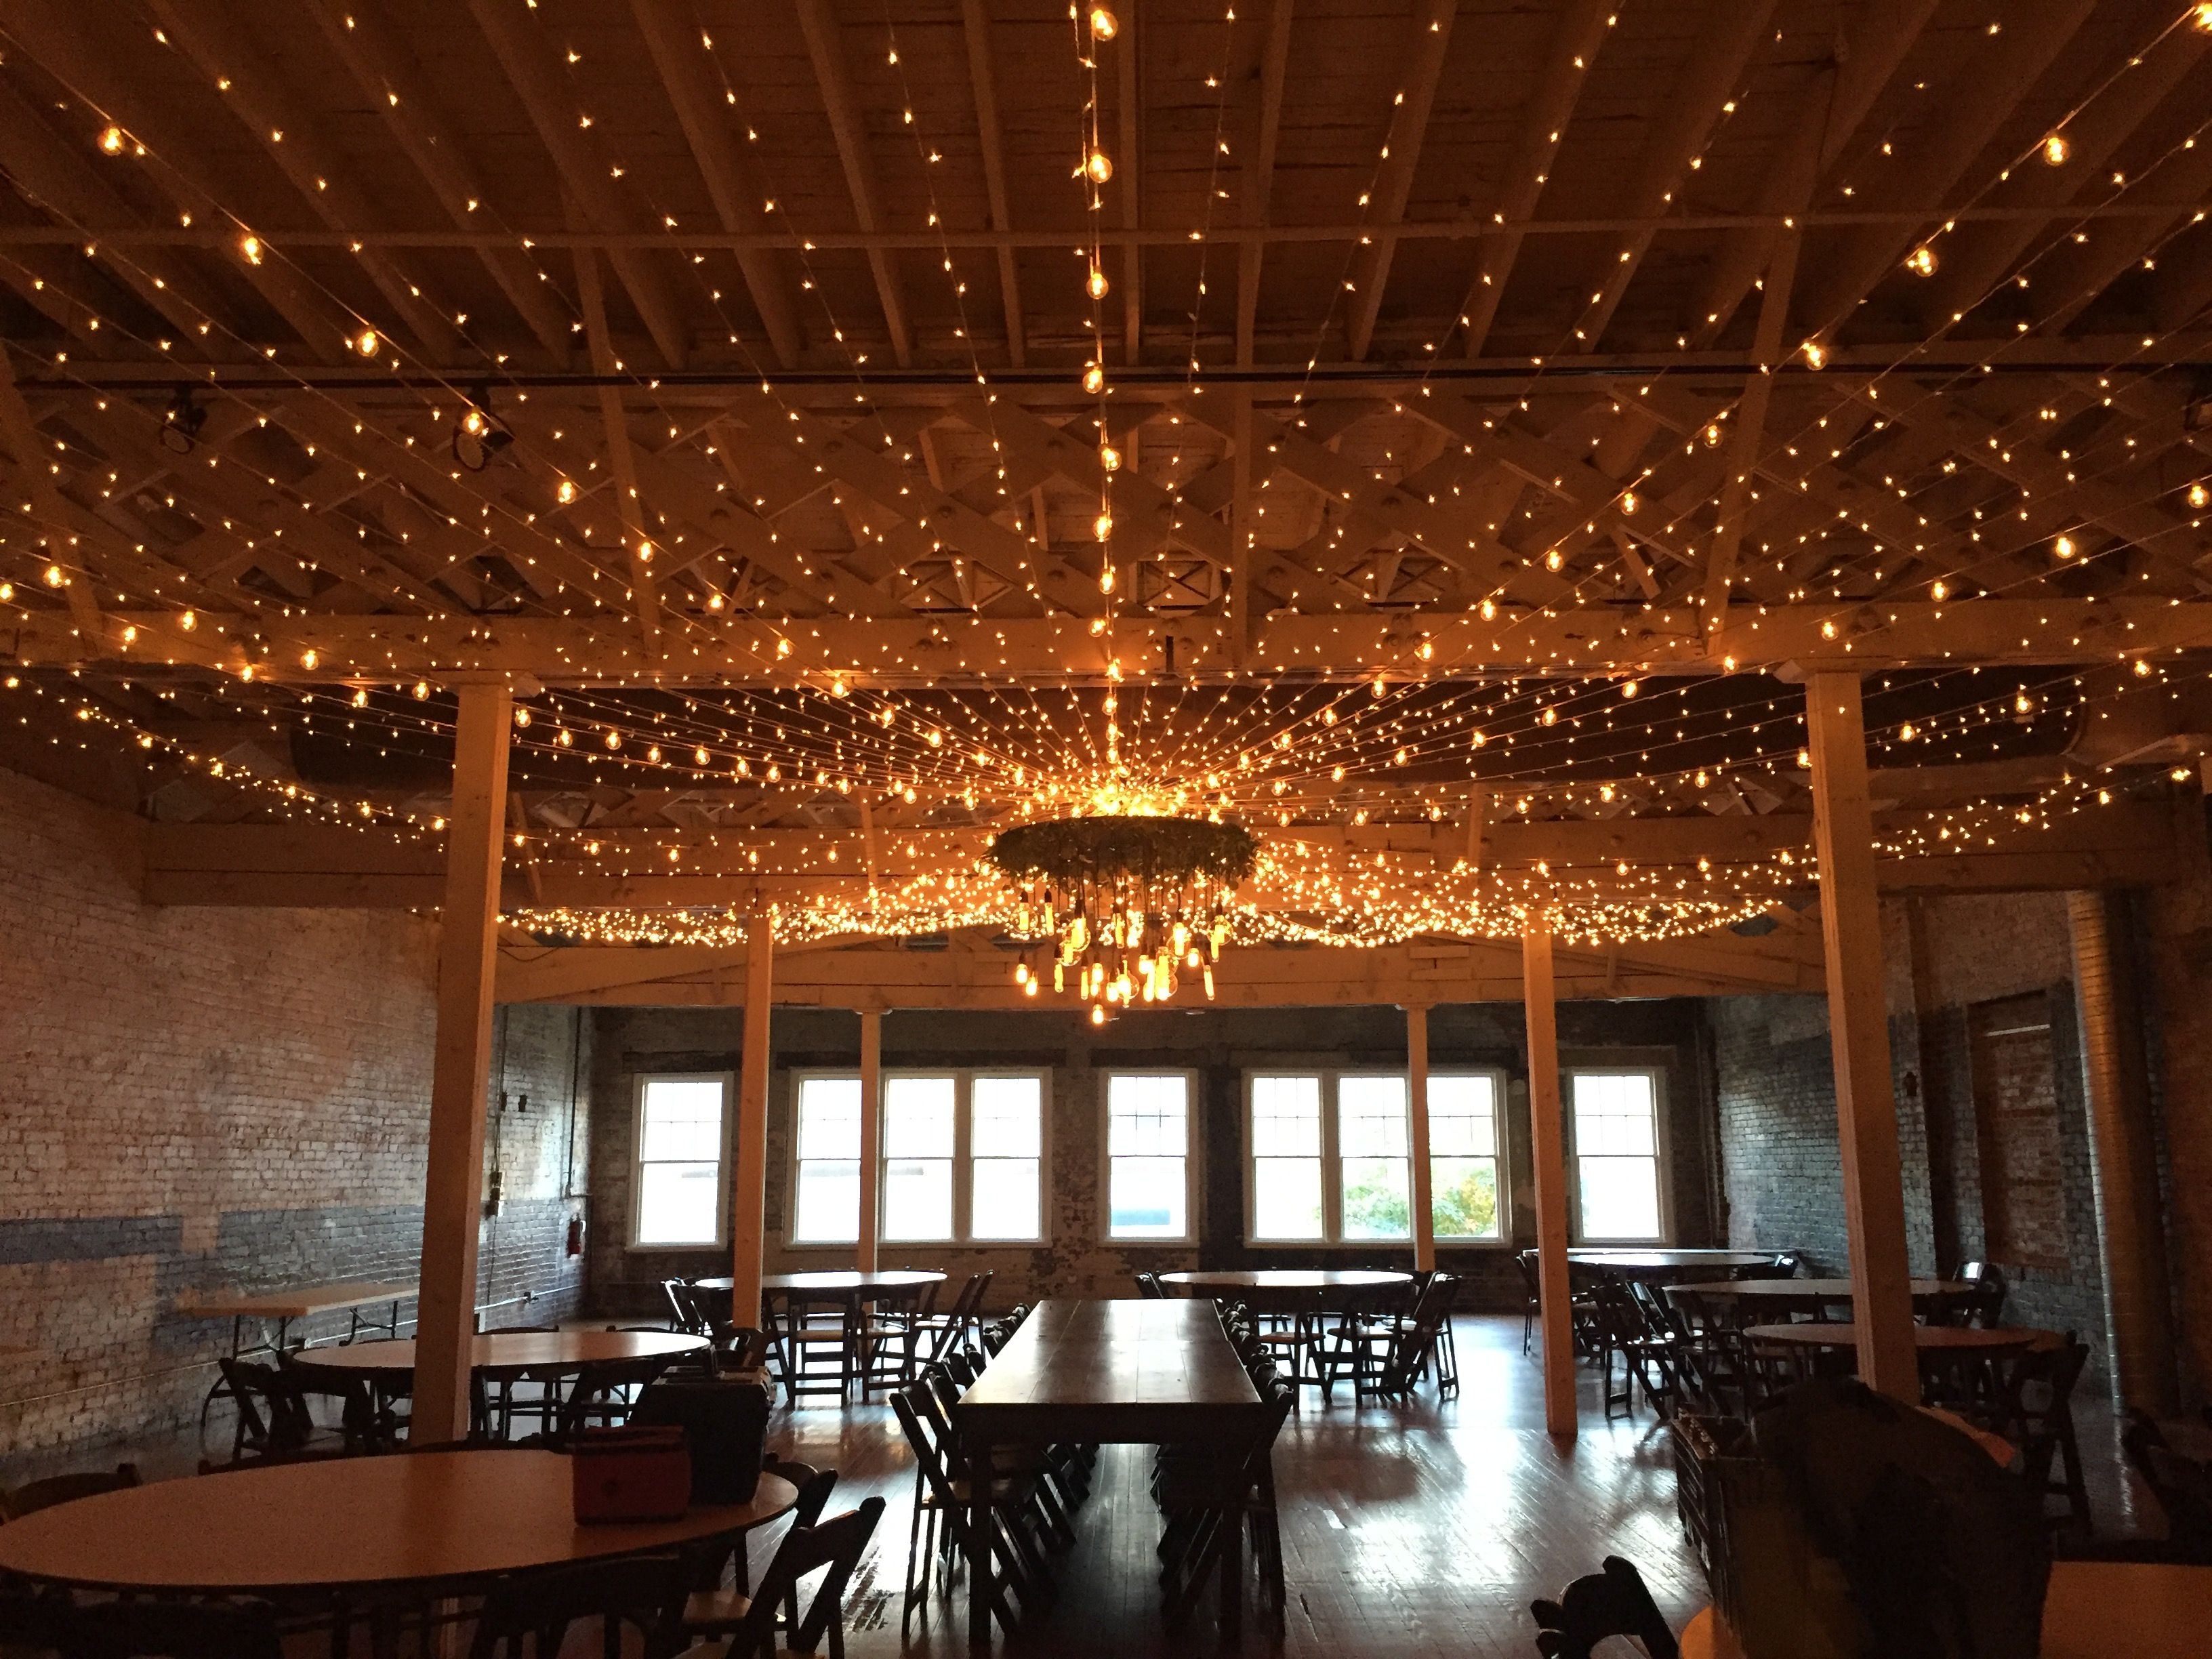 Get Lit Twinkle lights Market lights and an Edison Bulb